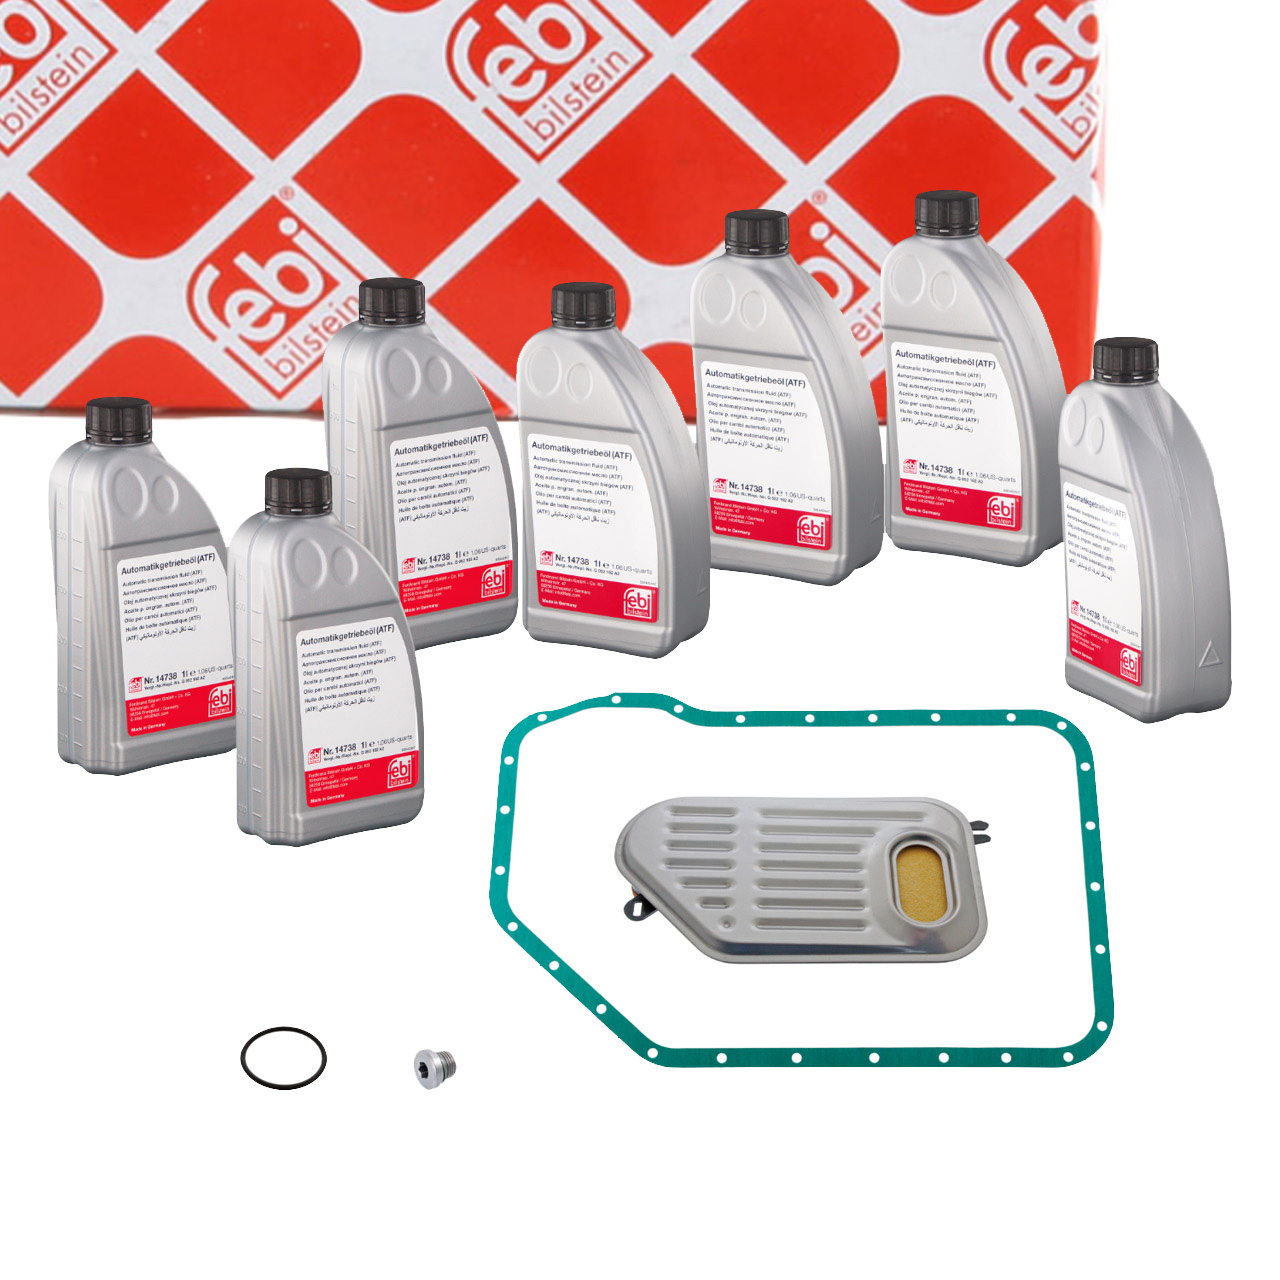 FEBI 171774 Automatikgetriebe Rep.Satz + 7L Getriebeöl AUDI VW 5-Gang 01V 5HP19FL/FLA